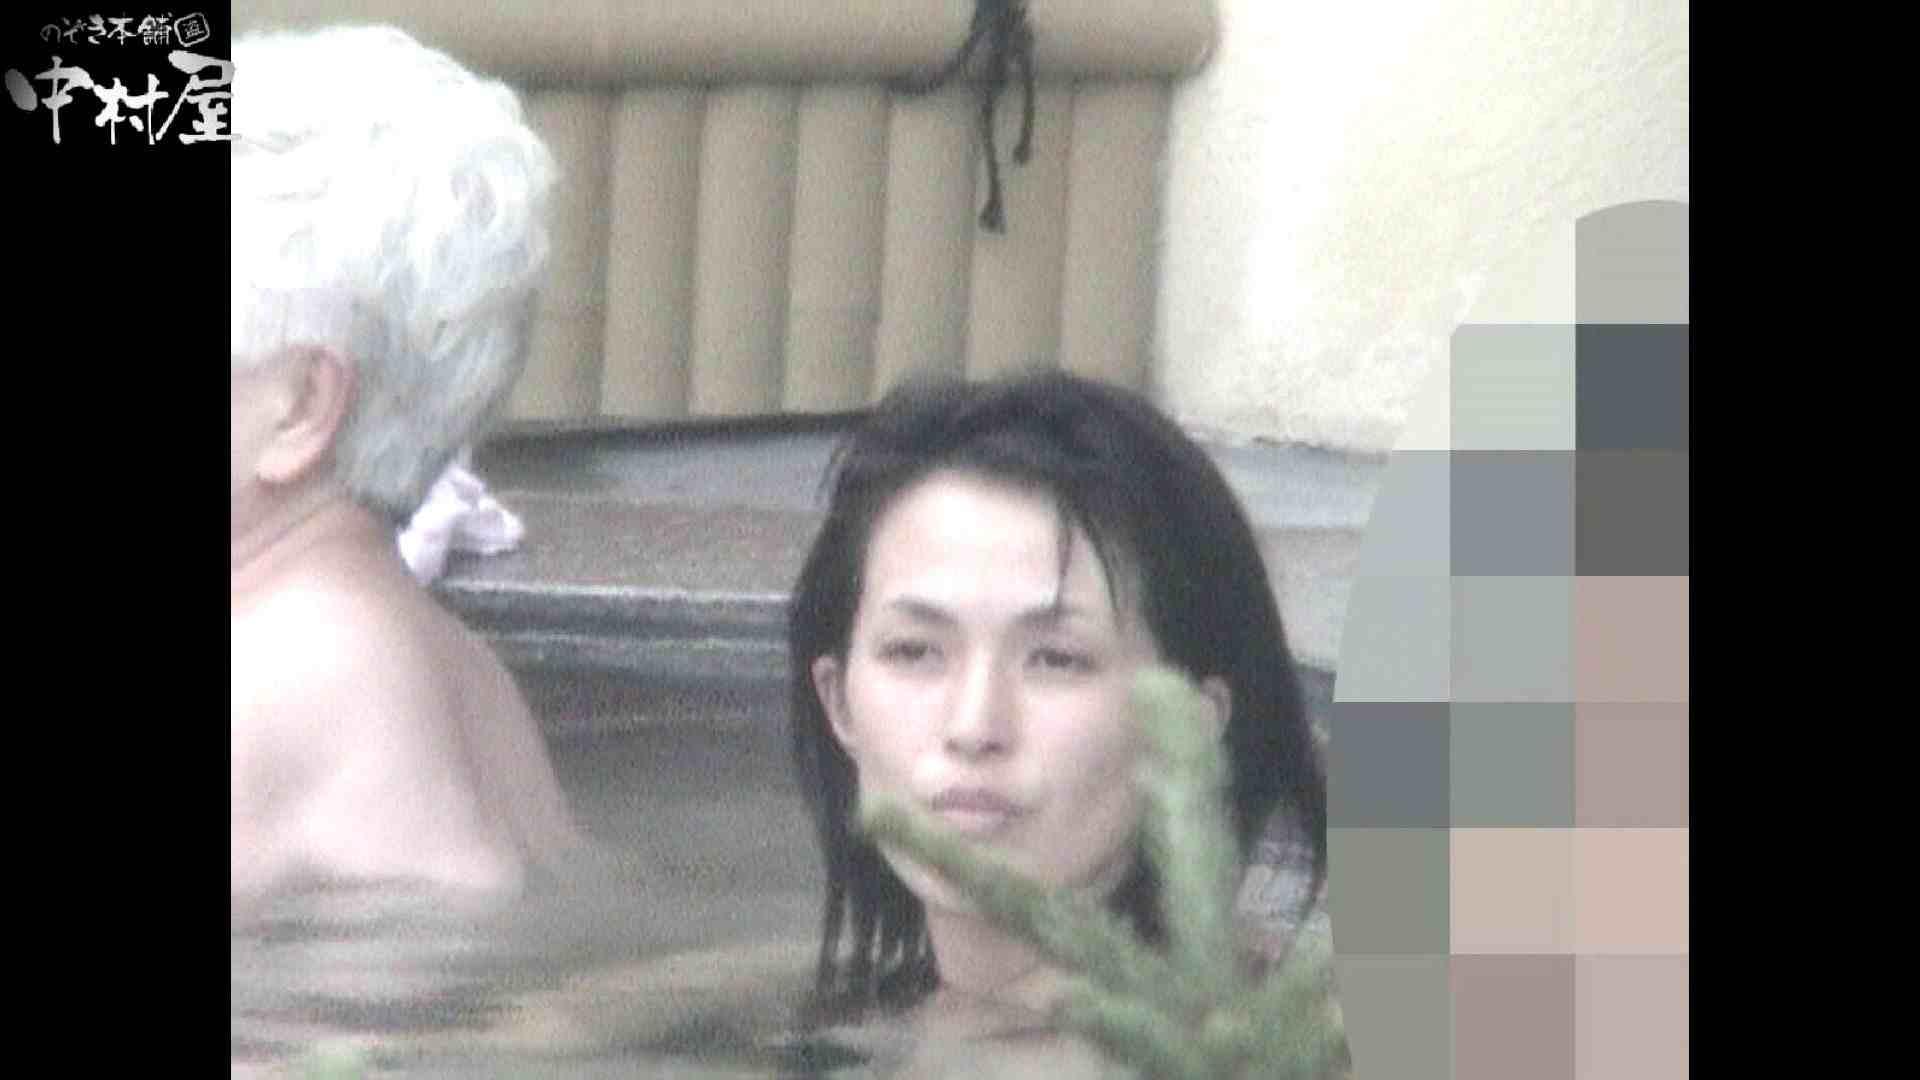 Aquaな露天風呂Vol.933 盗撮 おまんこ動画流出 78PICs 77